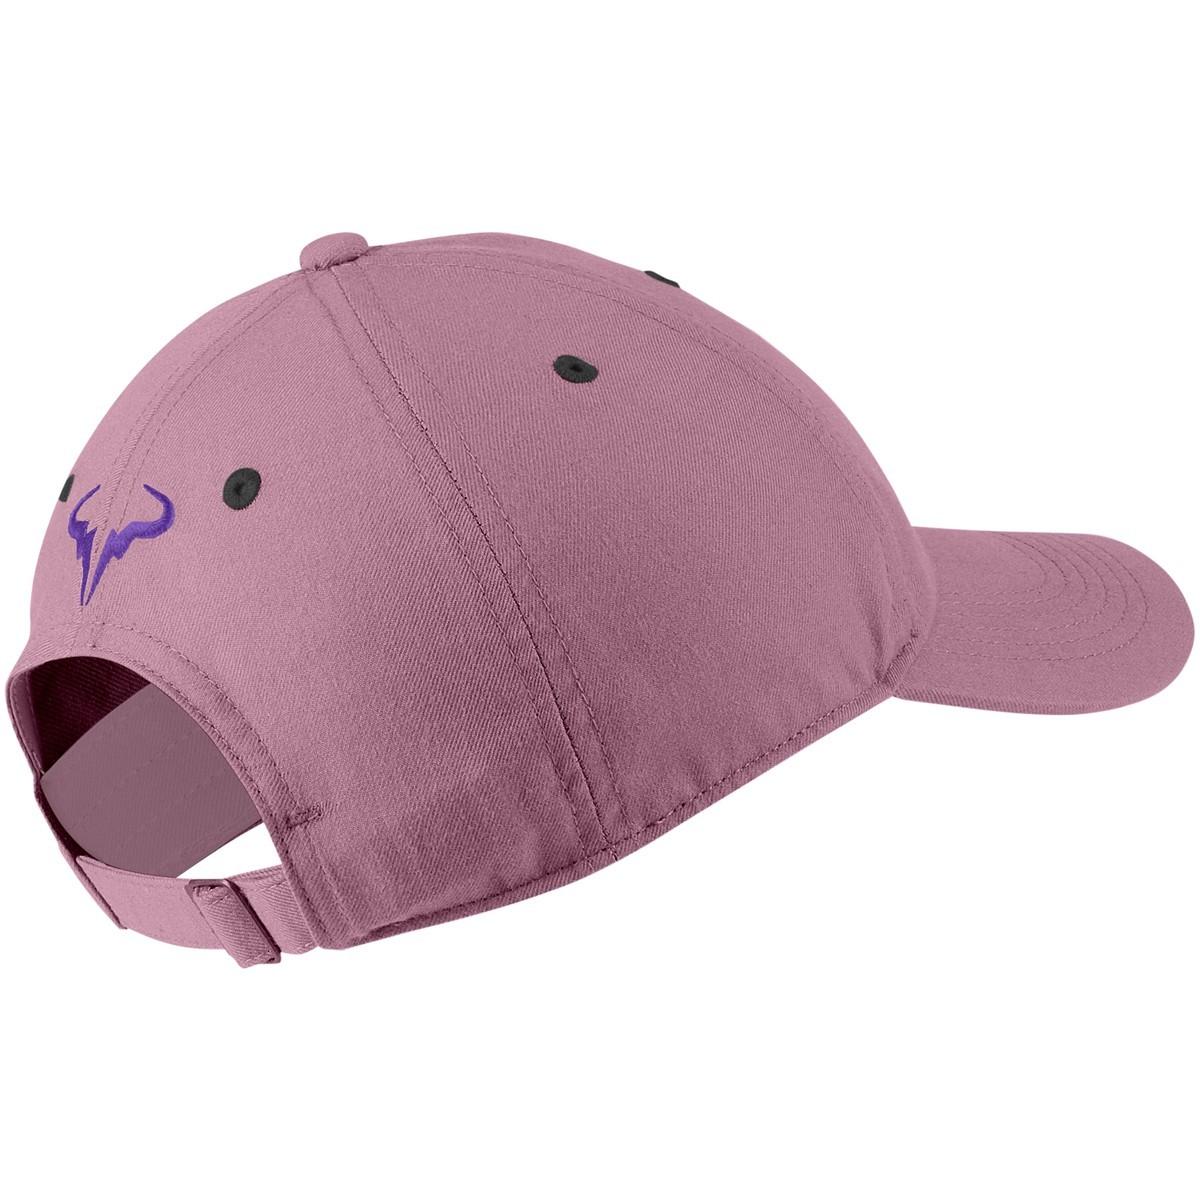 Теннисная кепка Nike Rafa U Aerobill H86 Cap elemental pink/wild berry